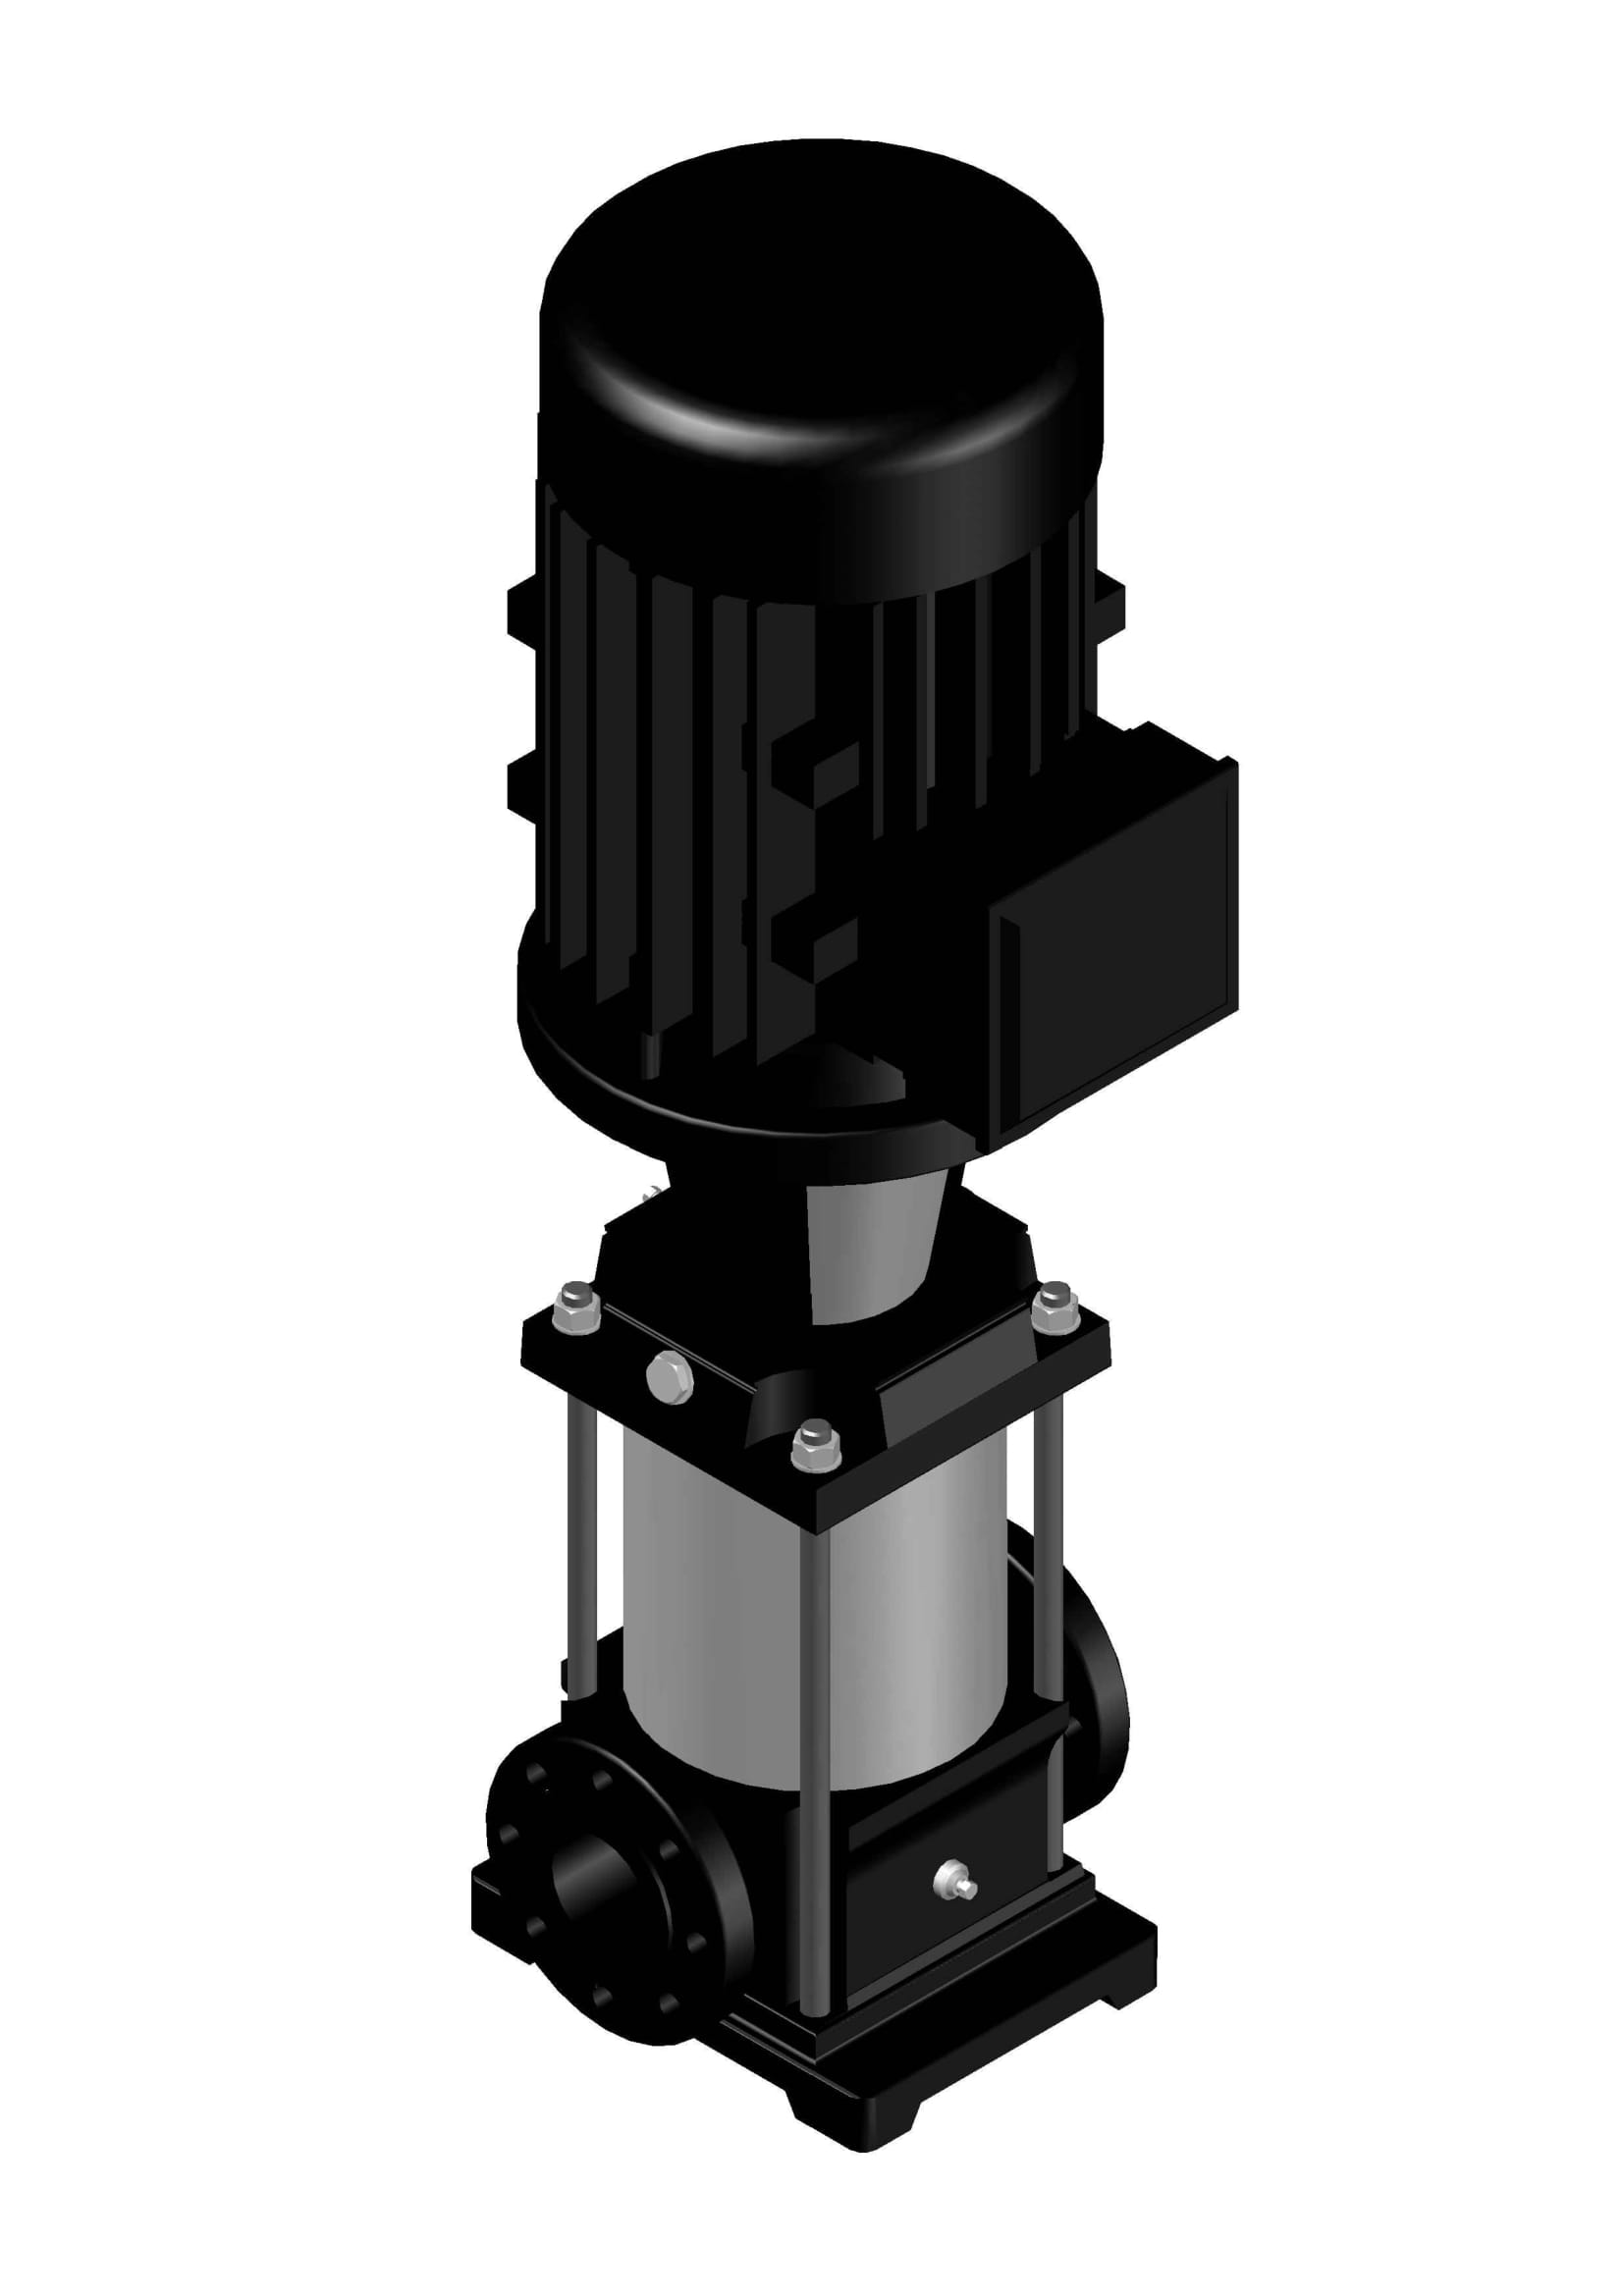 BV 45-03-02